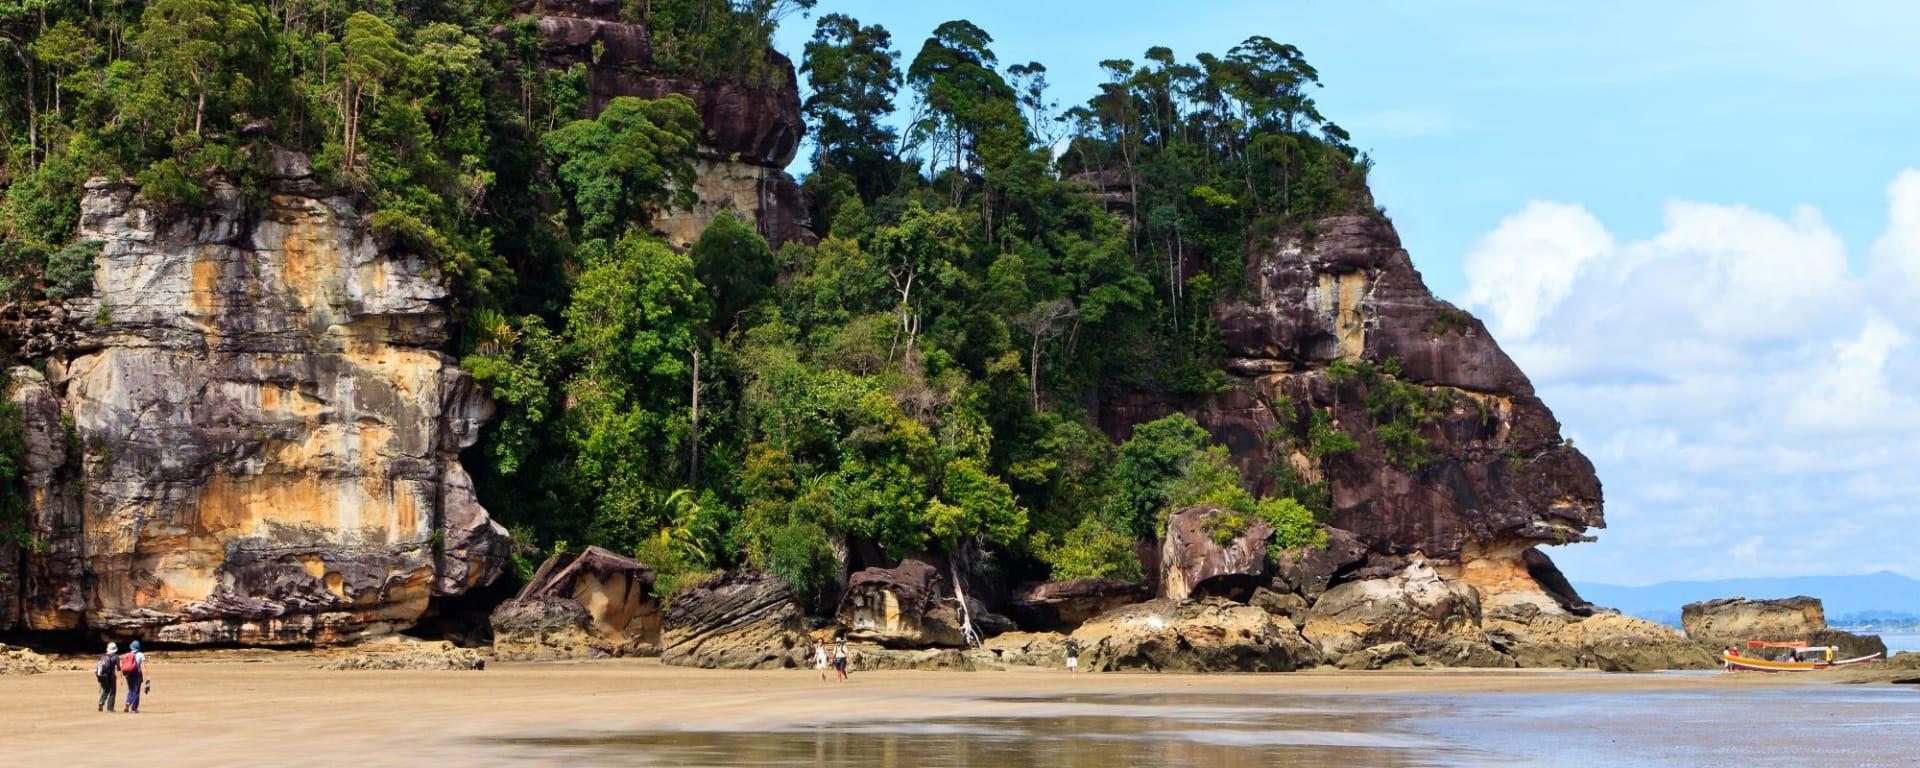 Natur pur in Sarawak ab Kuching: Bako National Park